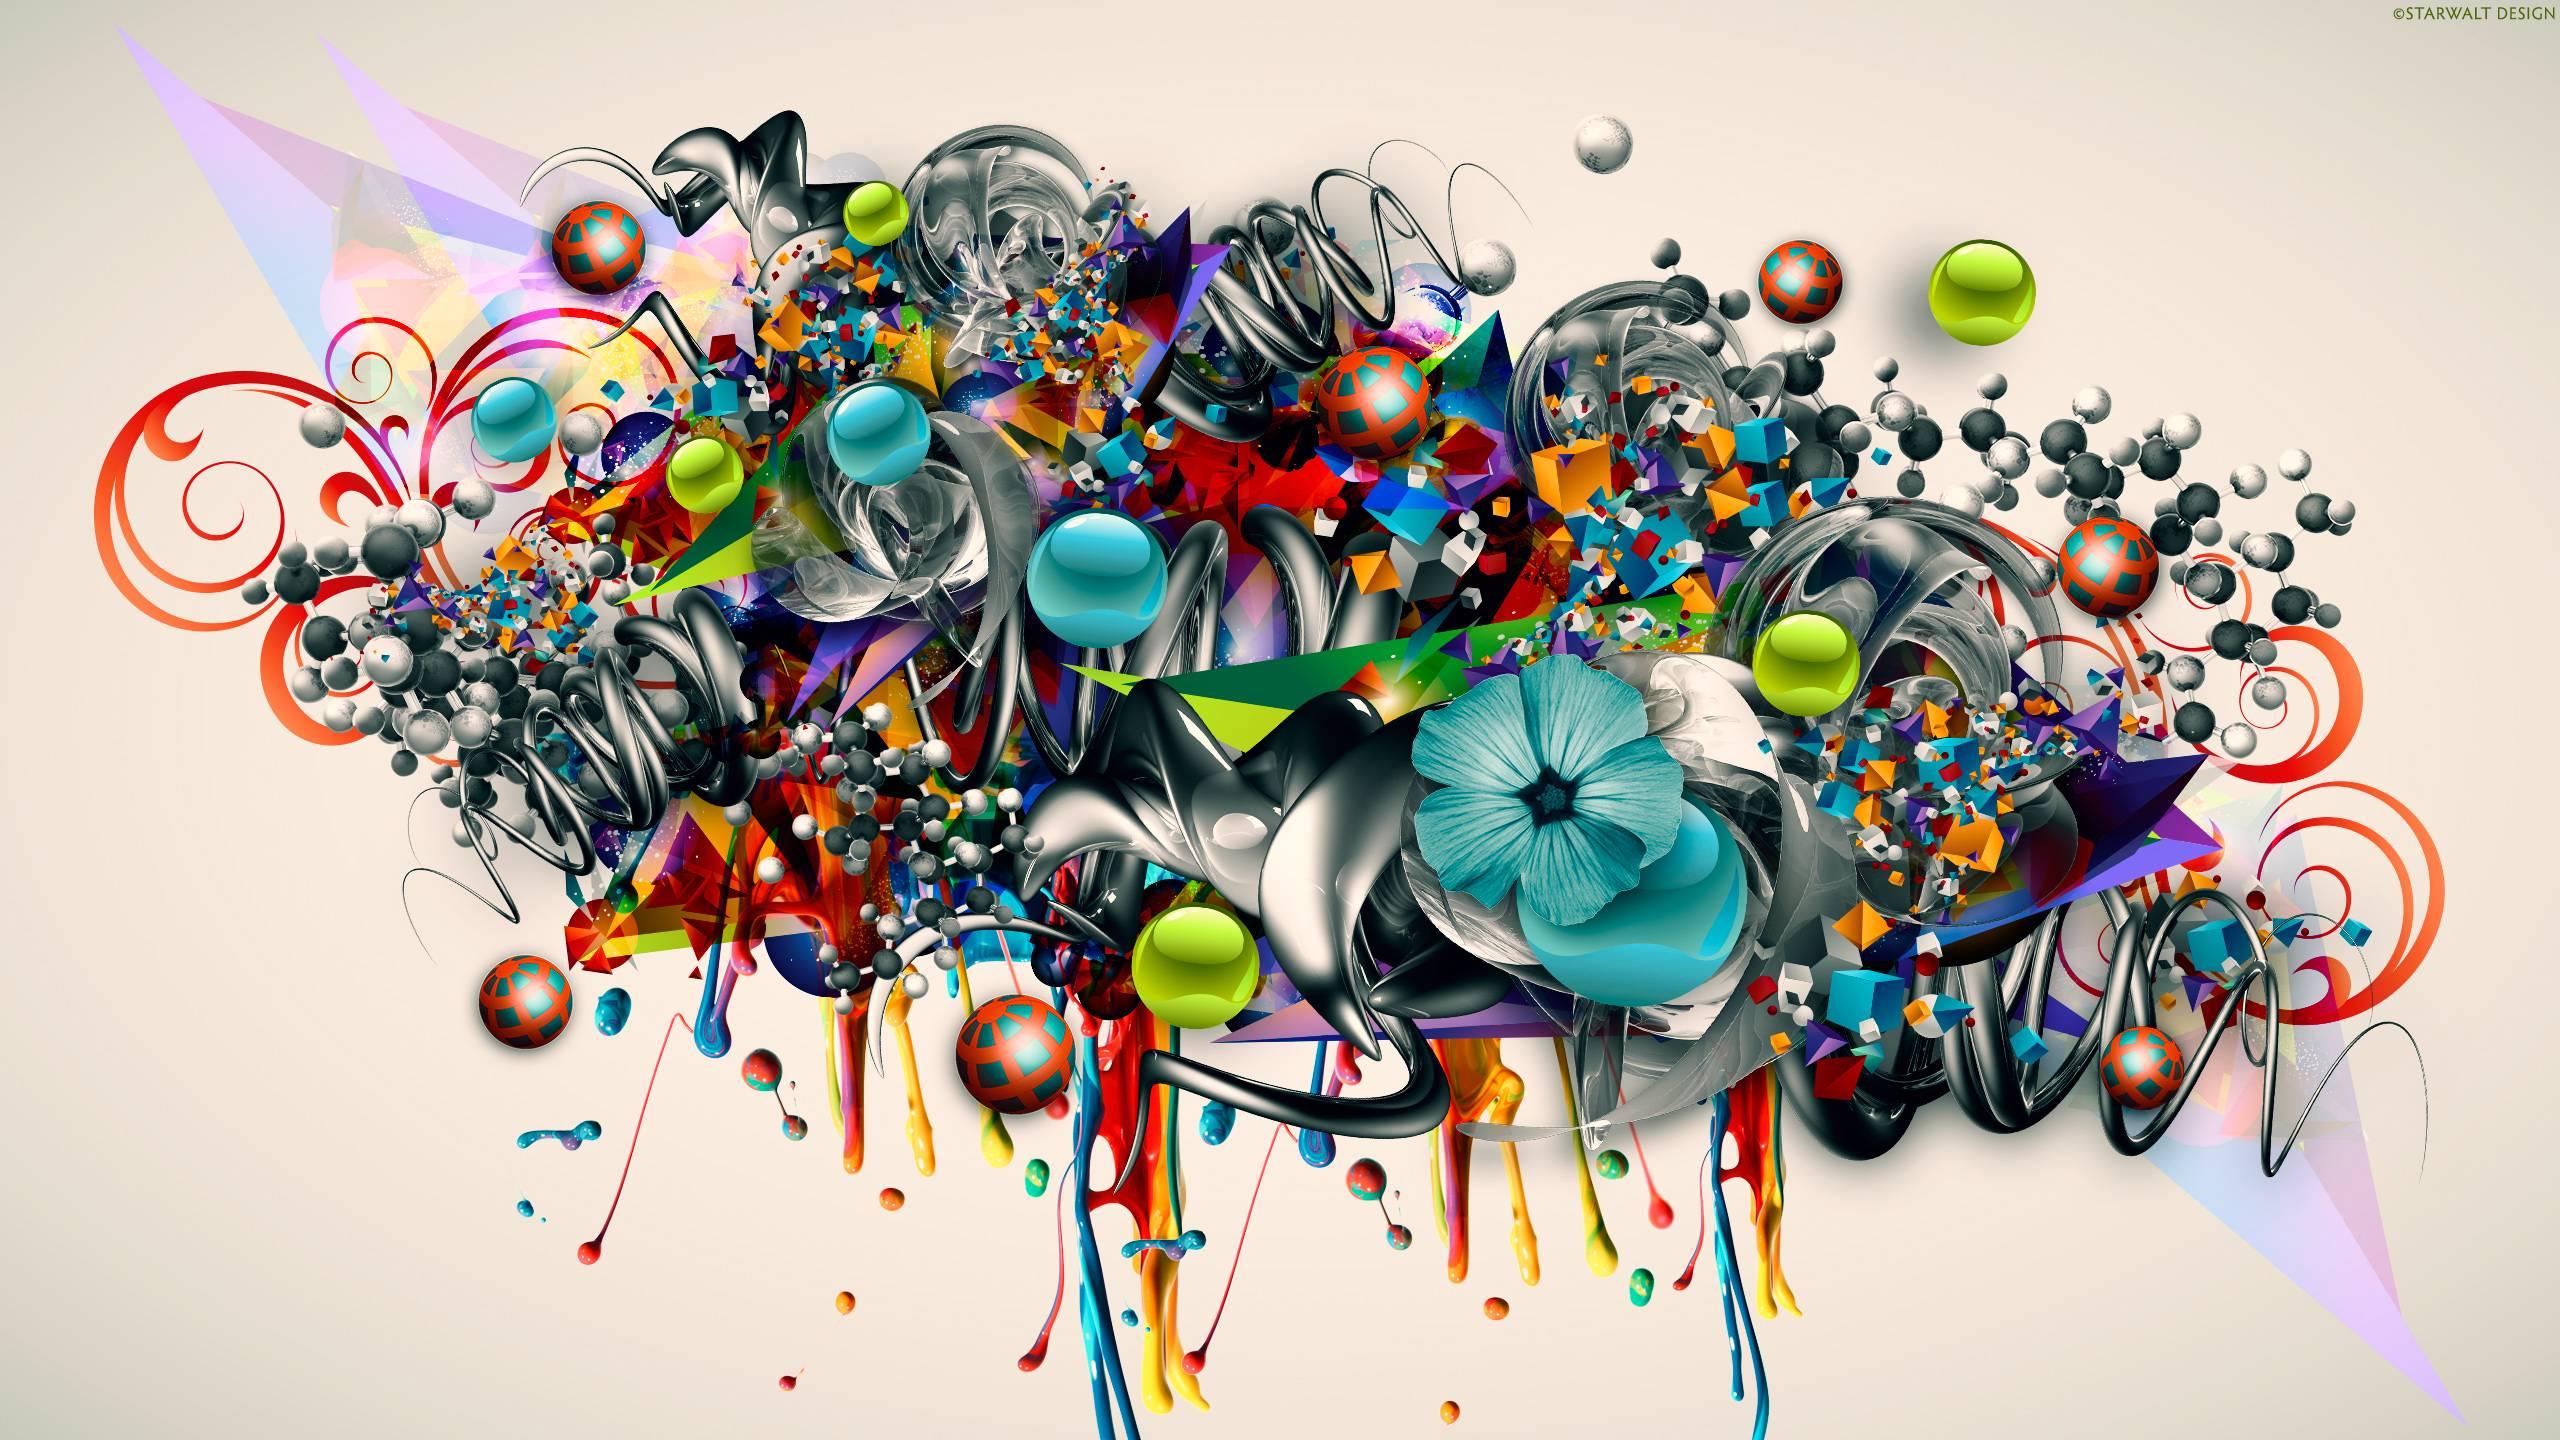 Graffiti art wallpaper - Graffiti Art 3d Color Psychedelic Flowers Urban Wallpaper 2560x1440